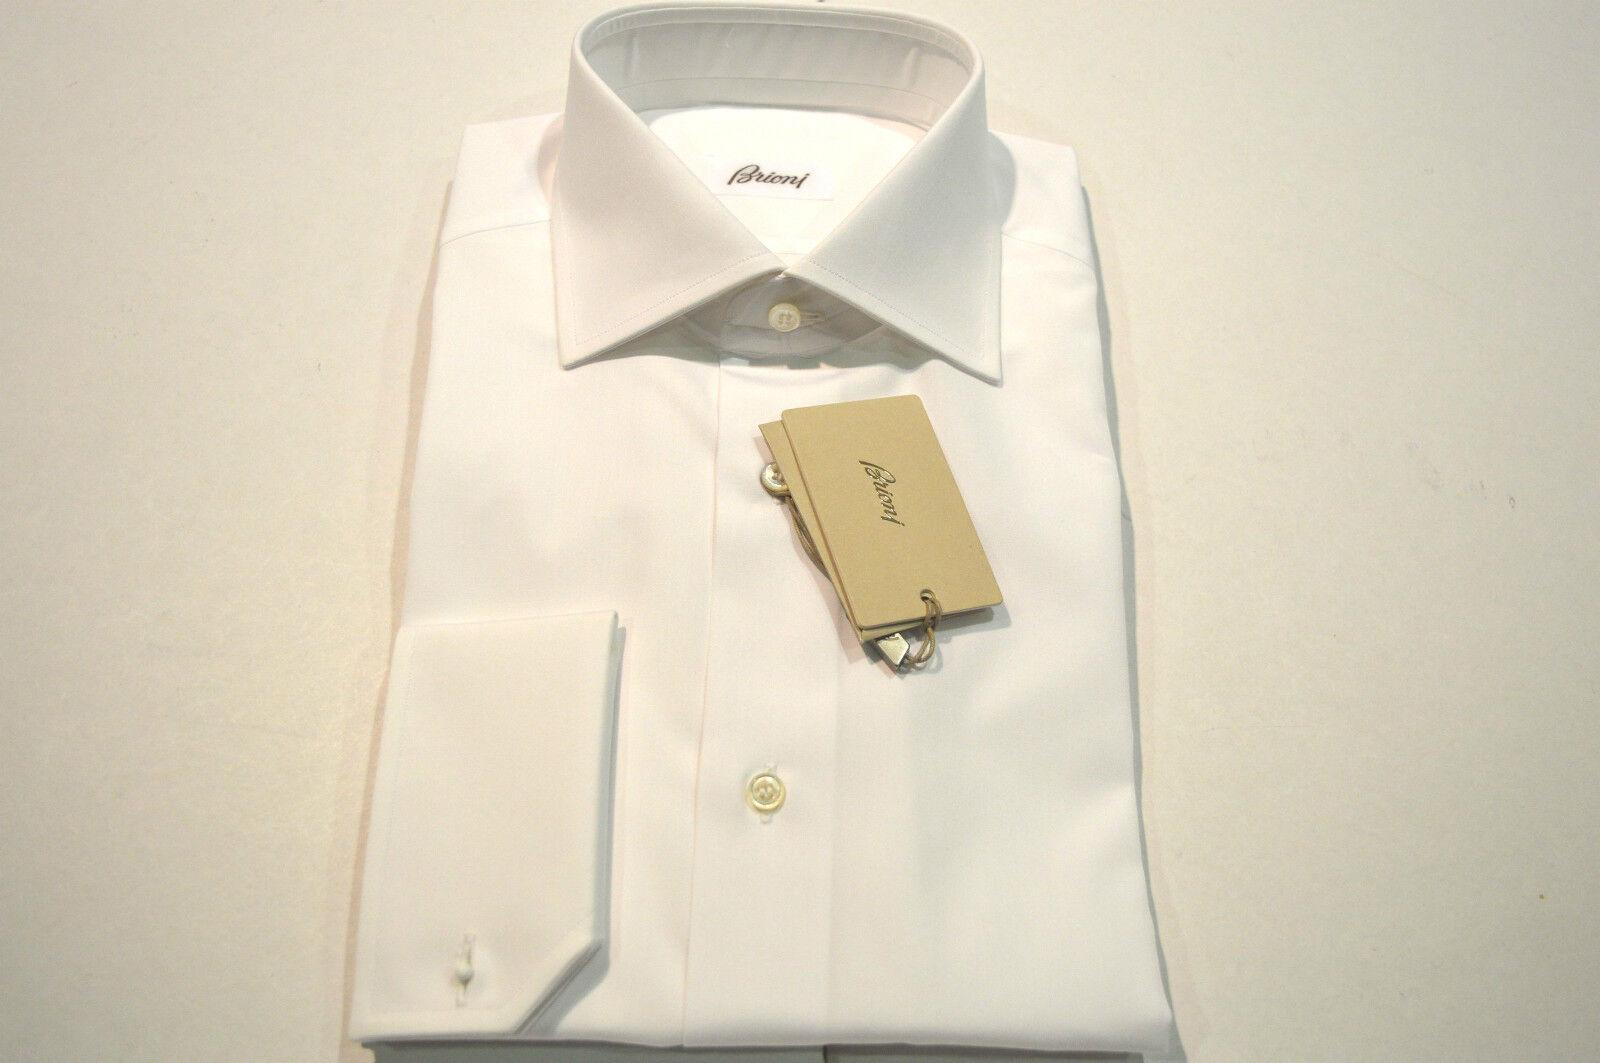 NEW BRIONI Dress White SHIRT 100% Cotton Size 15 Us 38 Eu (Store Code SE14)